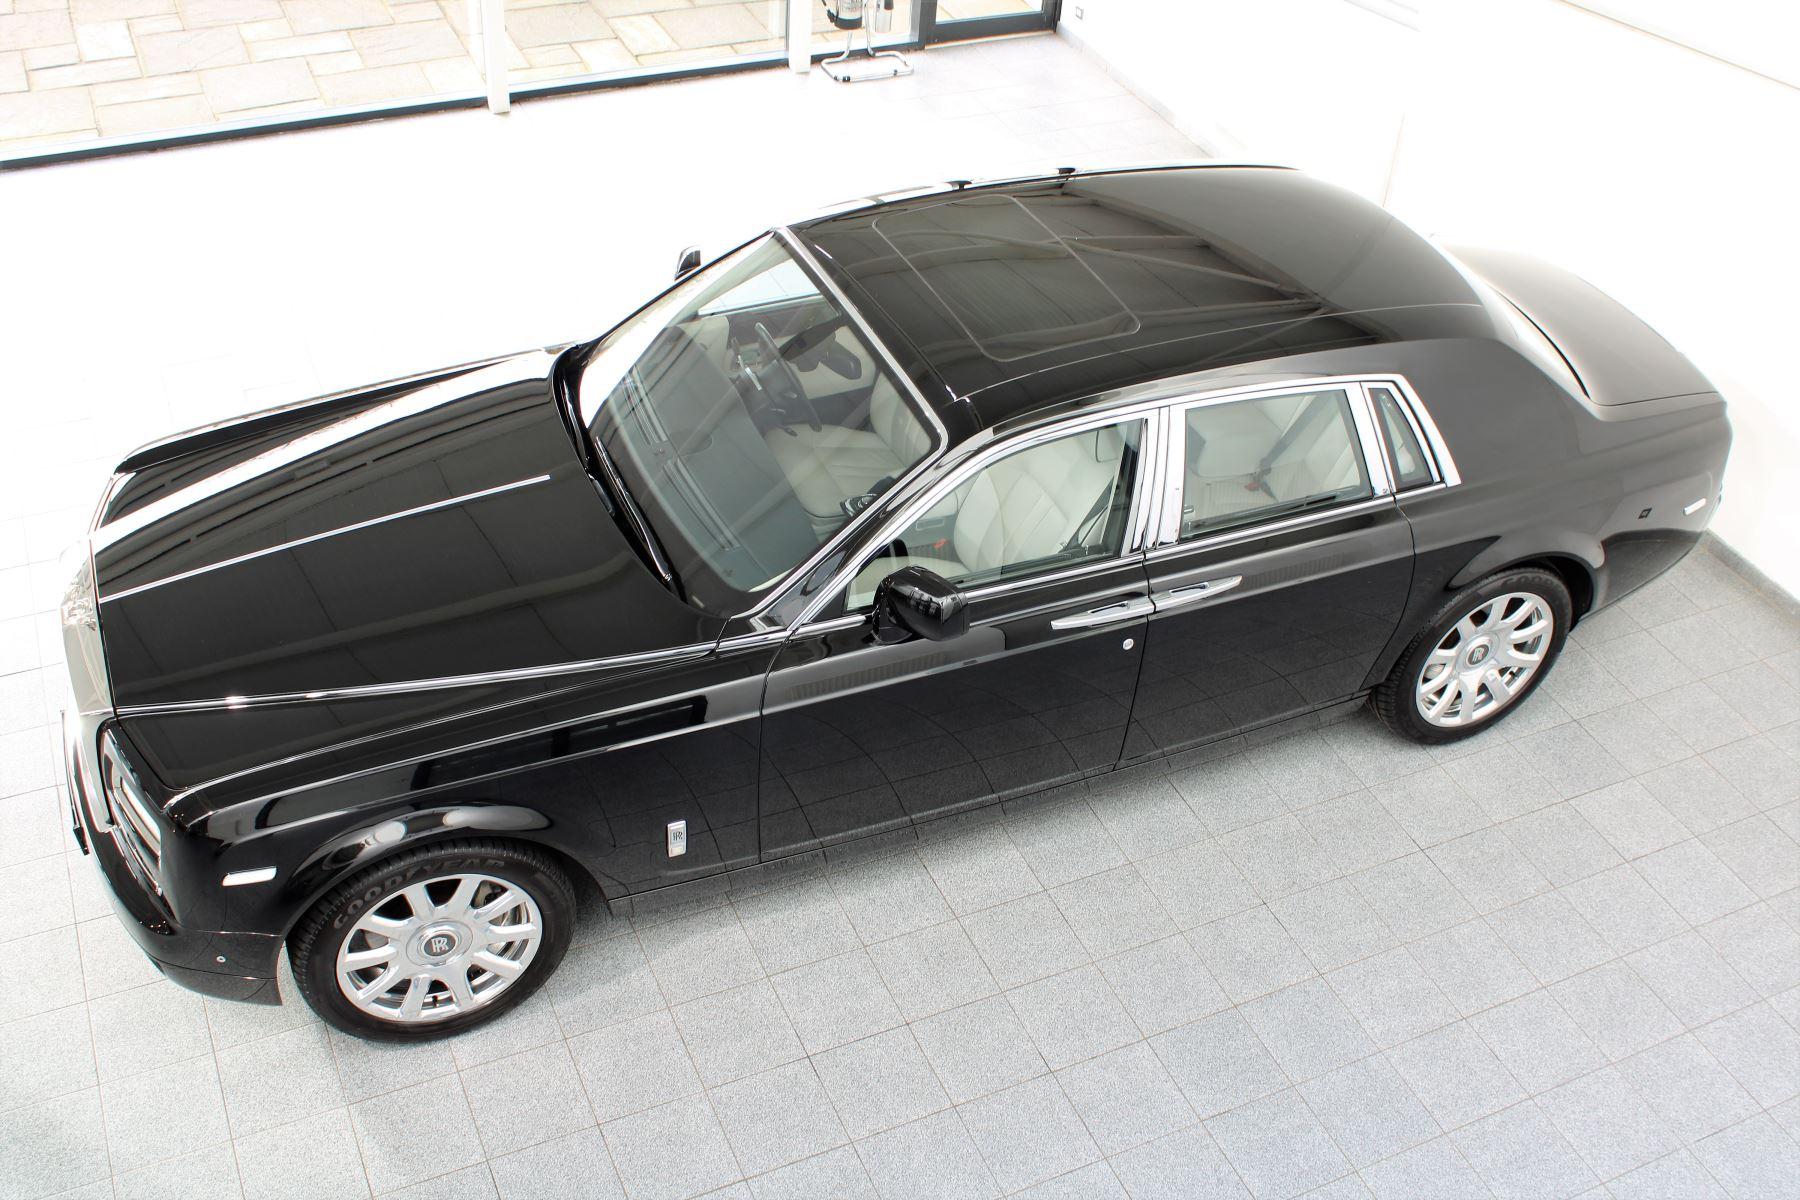 Rolls-Royce Phantom II 4dr Auto image 41